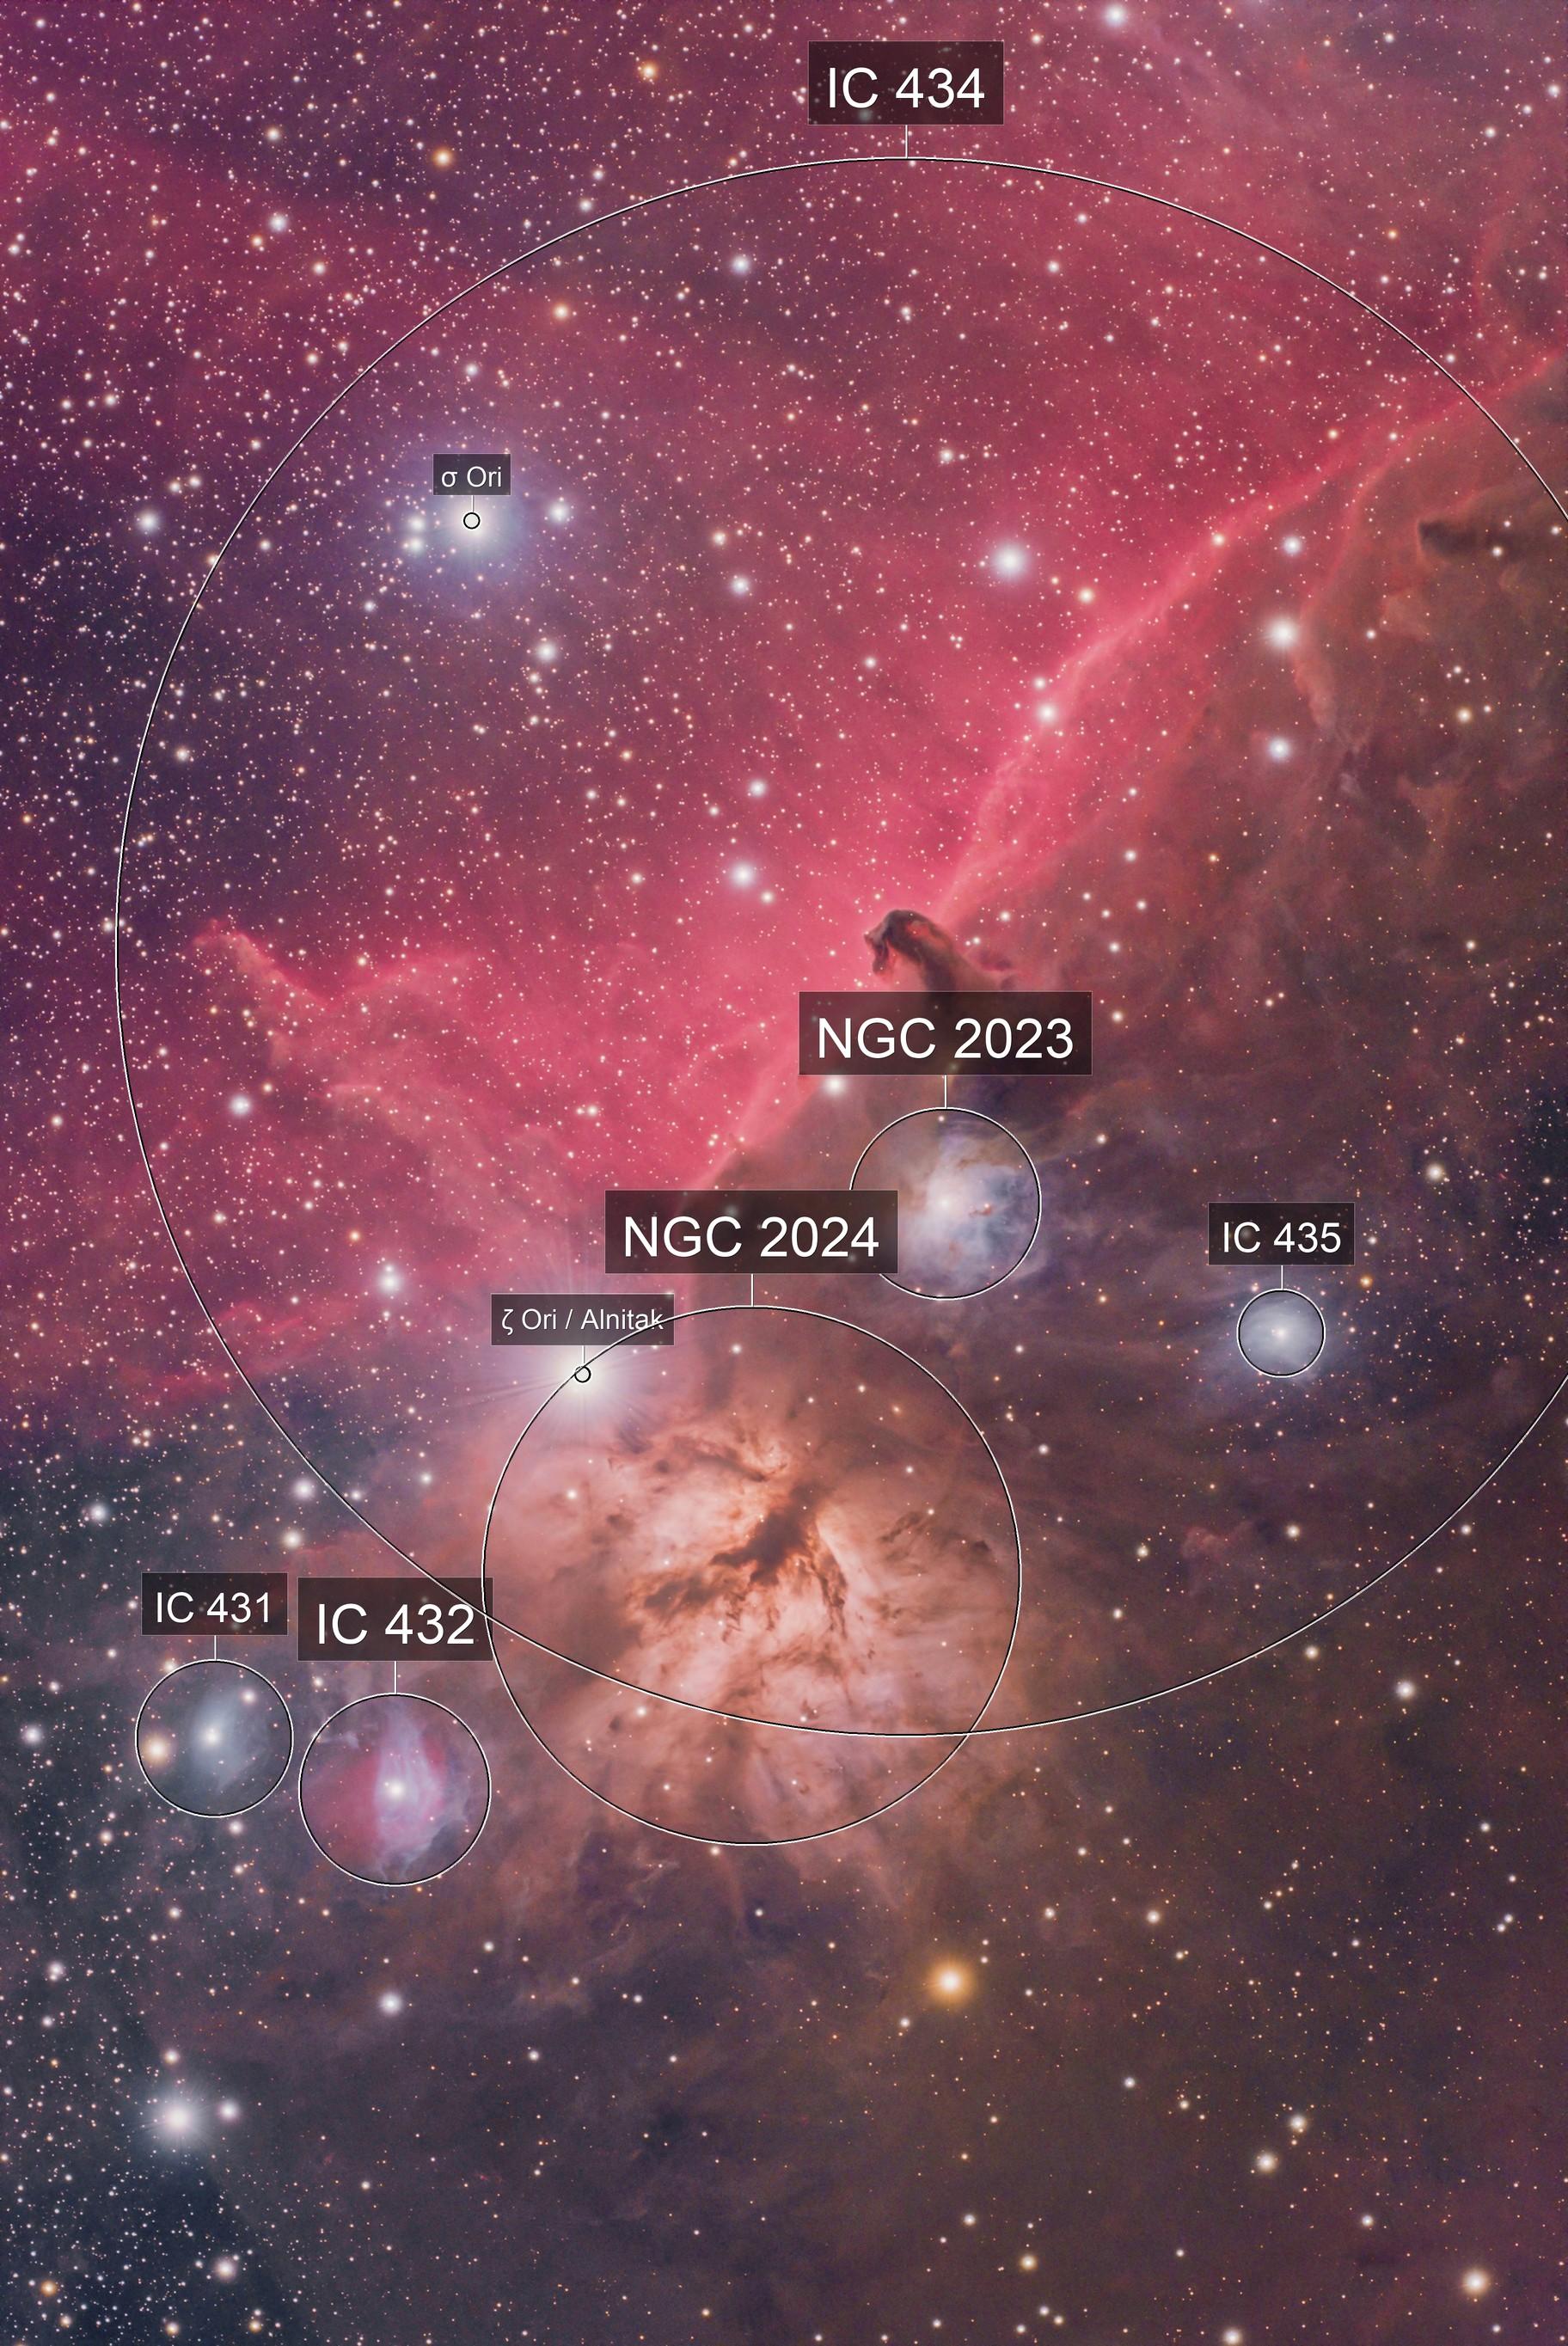 IC434, Barnard 33, Horsehead Nebula